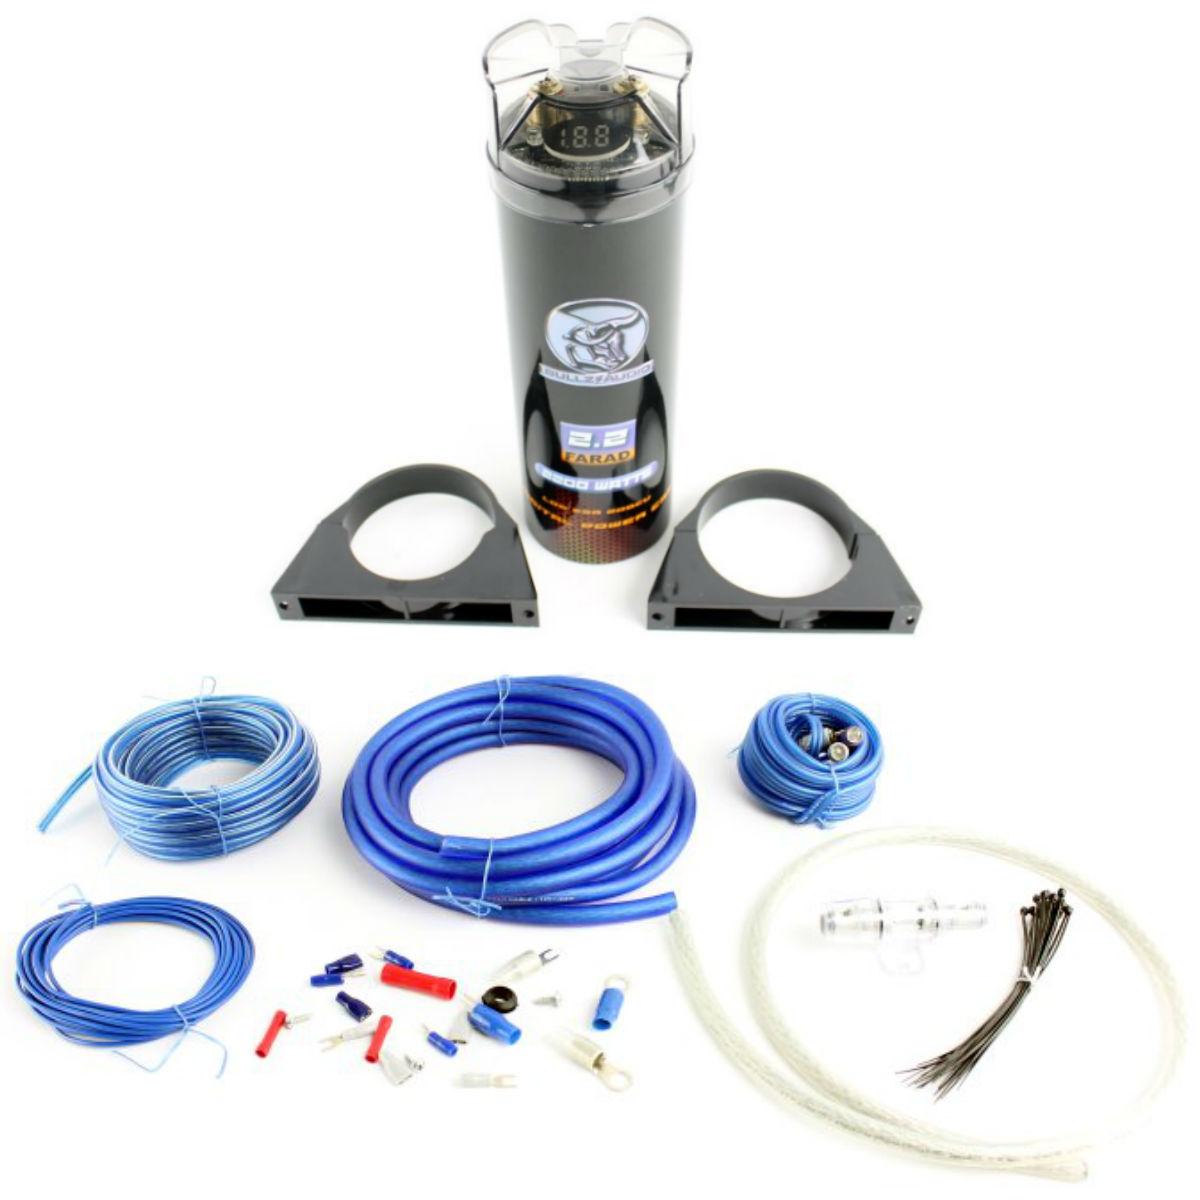 bullz audio bcap2.2 farad capacitor + epak4b 4 gauge amp ... 2 gauge wiring kit